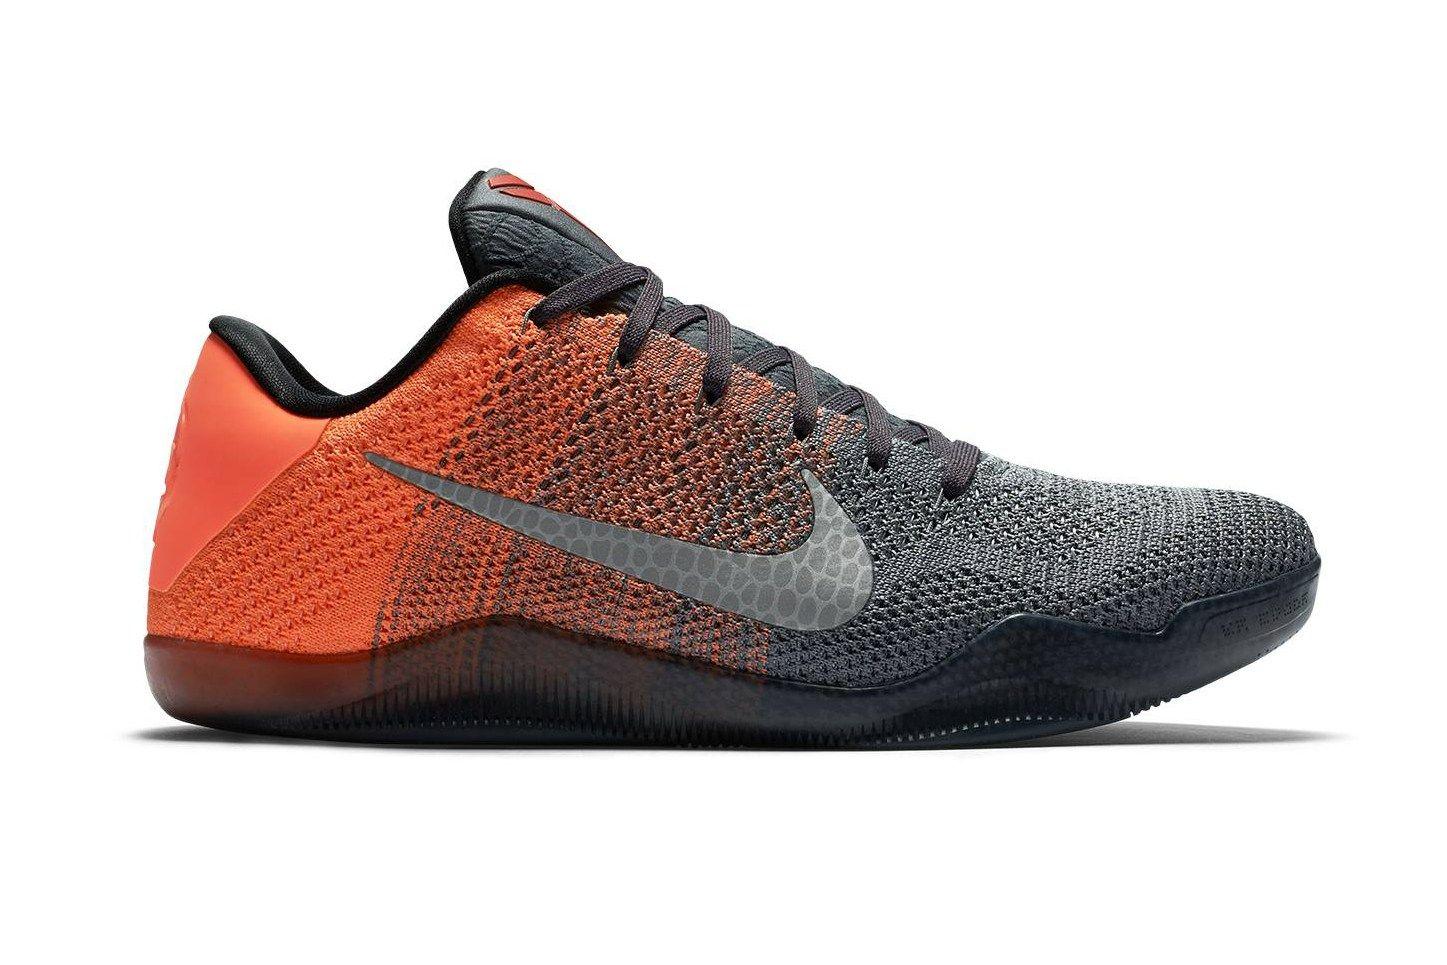 outlet store 5e6b0 035e9 Nike Basketball, Nike Air, Kobe Shoes, Shoes Sneakers, Air Jordan, Trendy